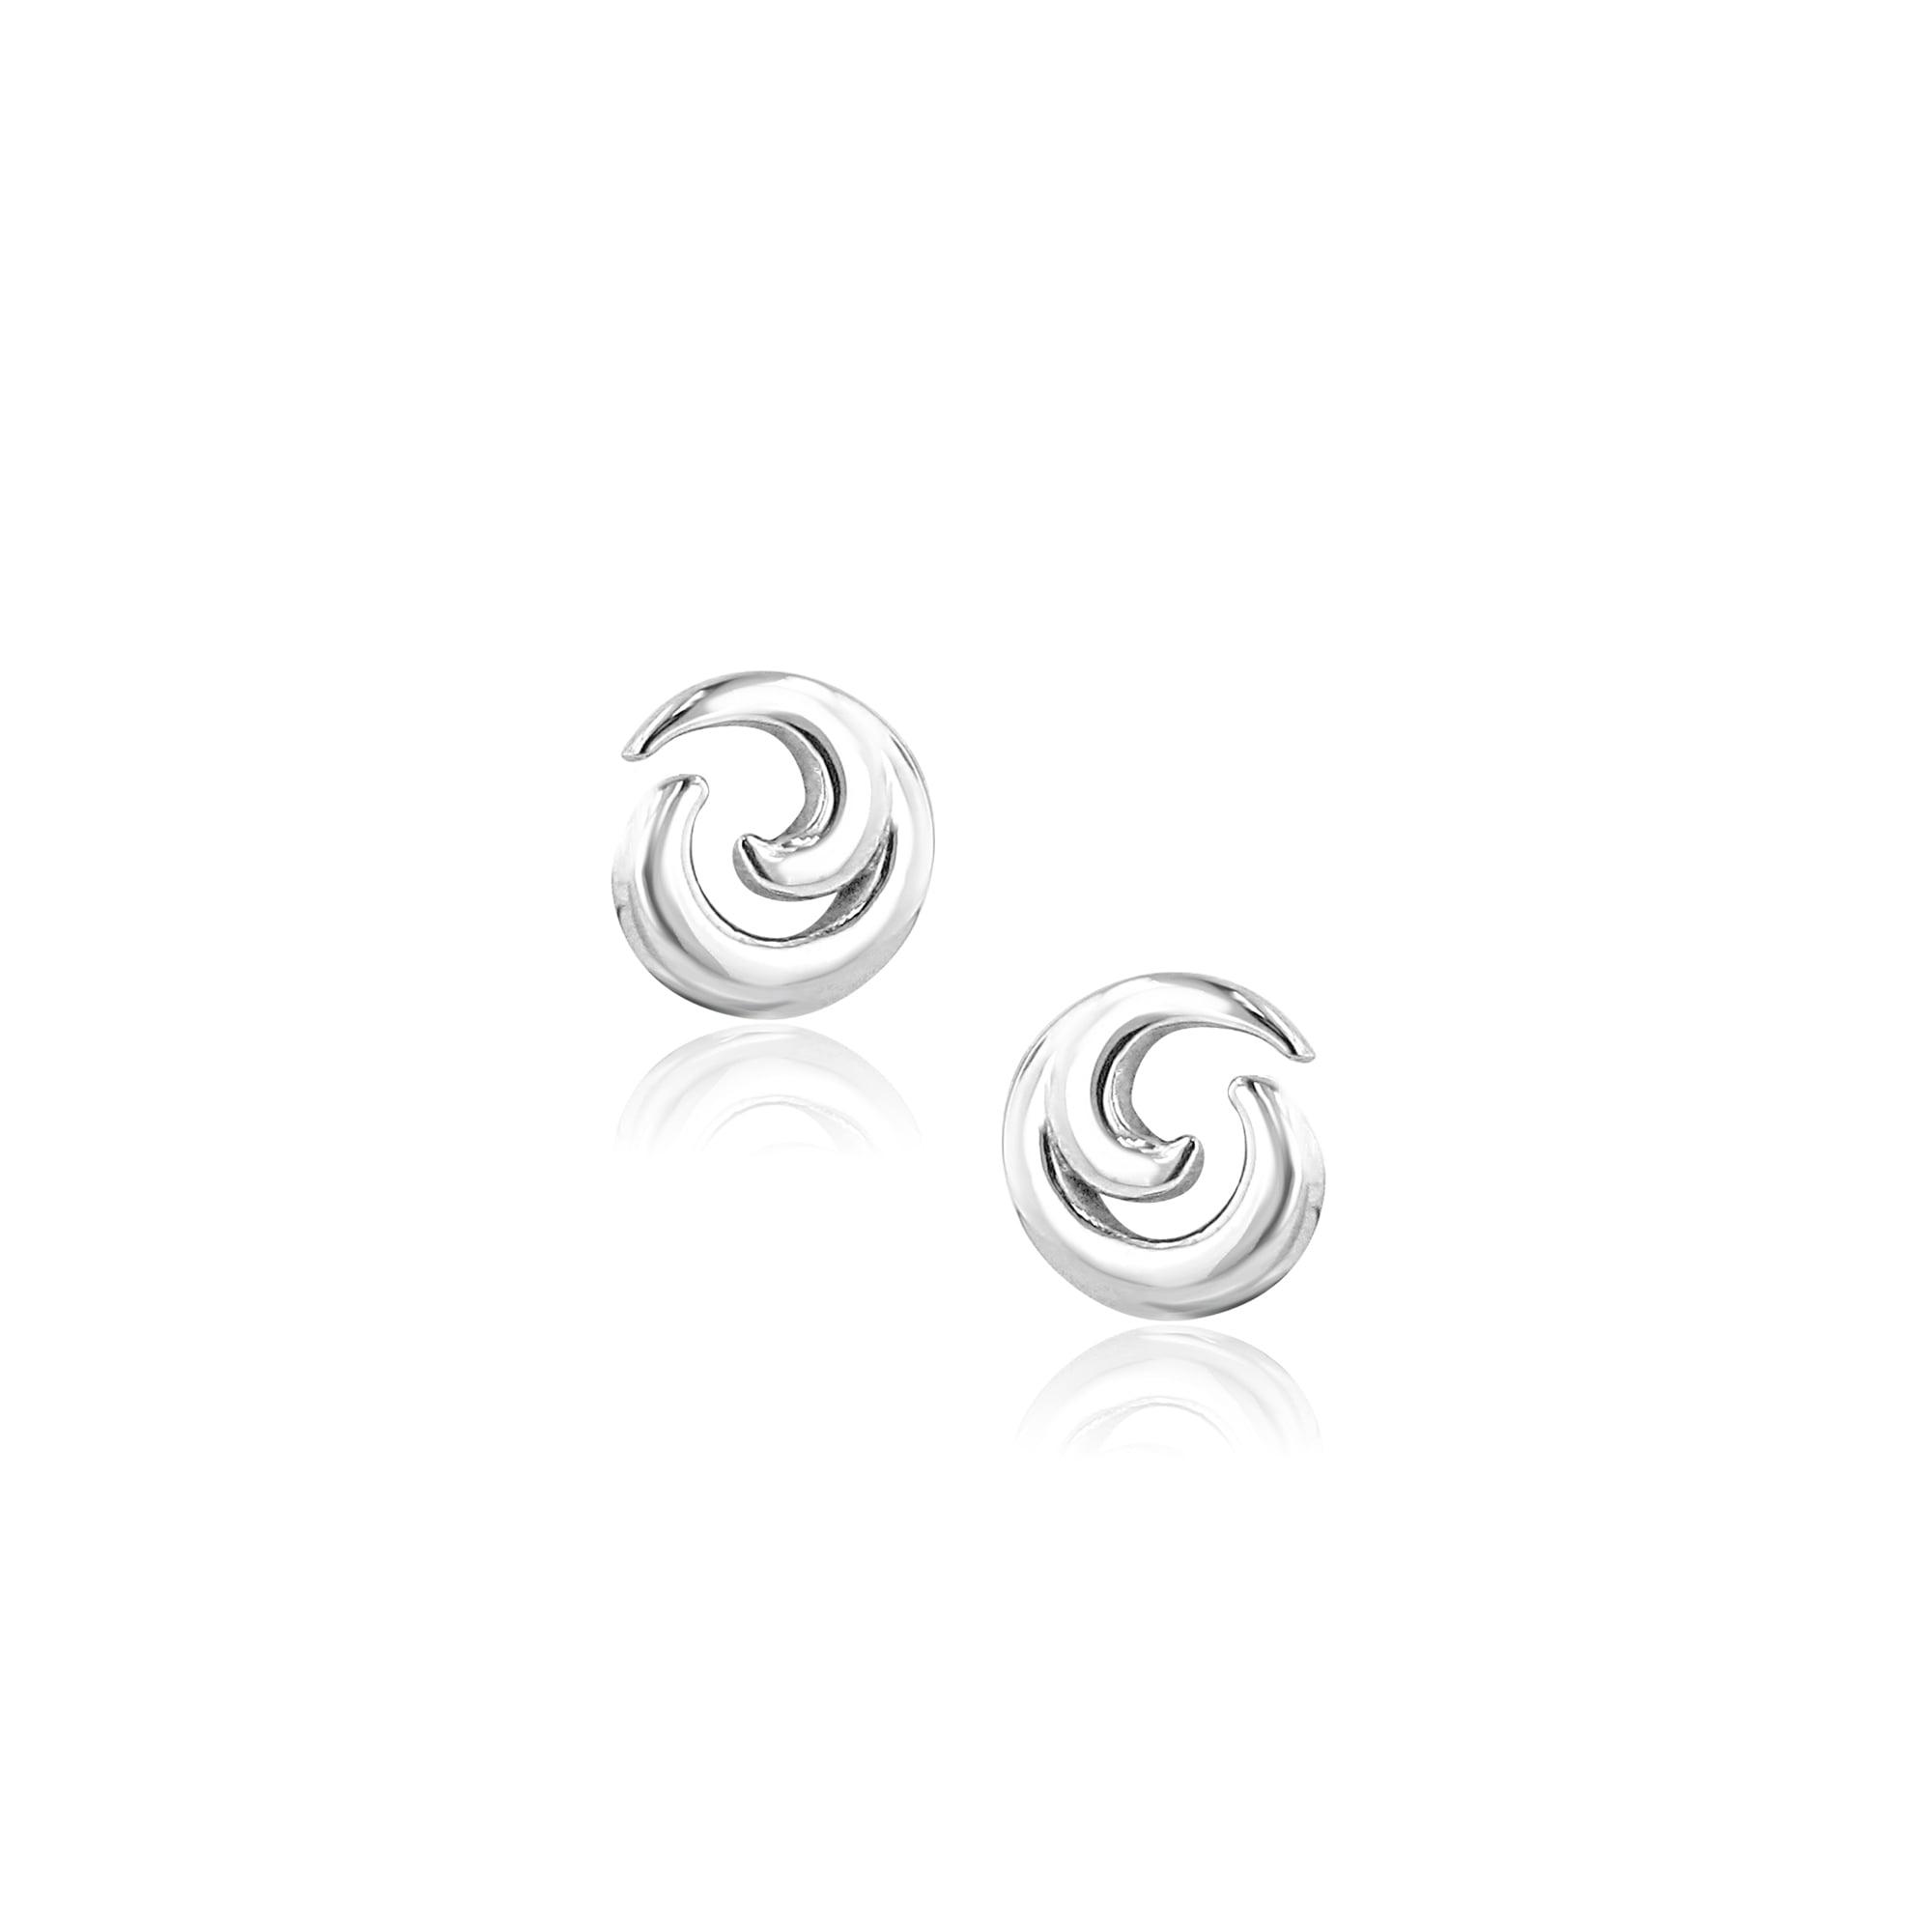 18ct White Gold Avanti Designed Stud Earrings 237f96354